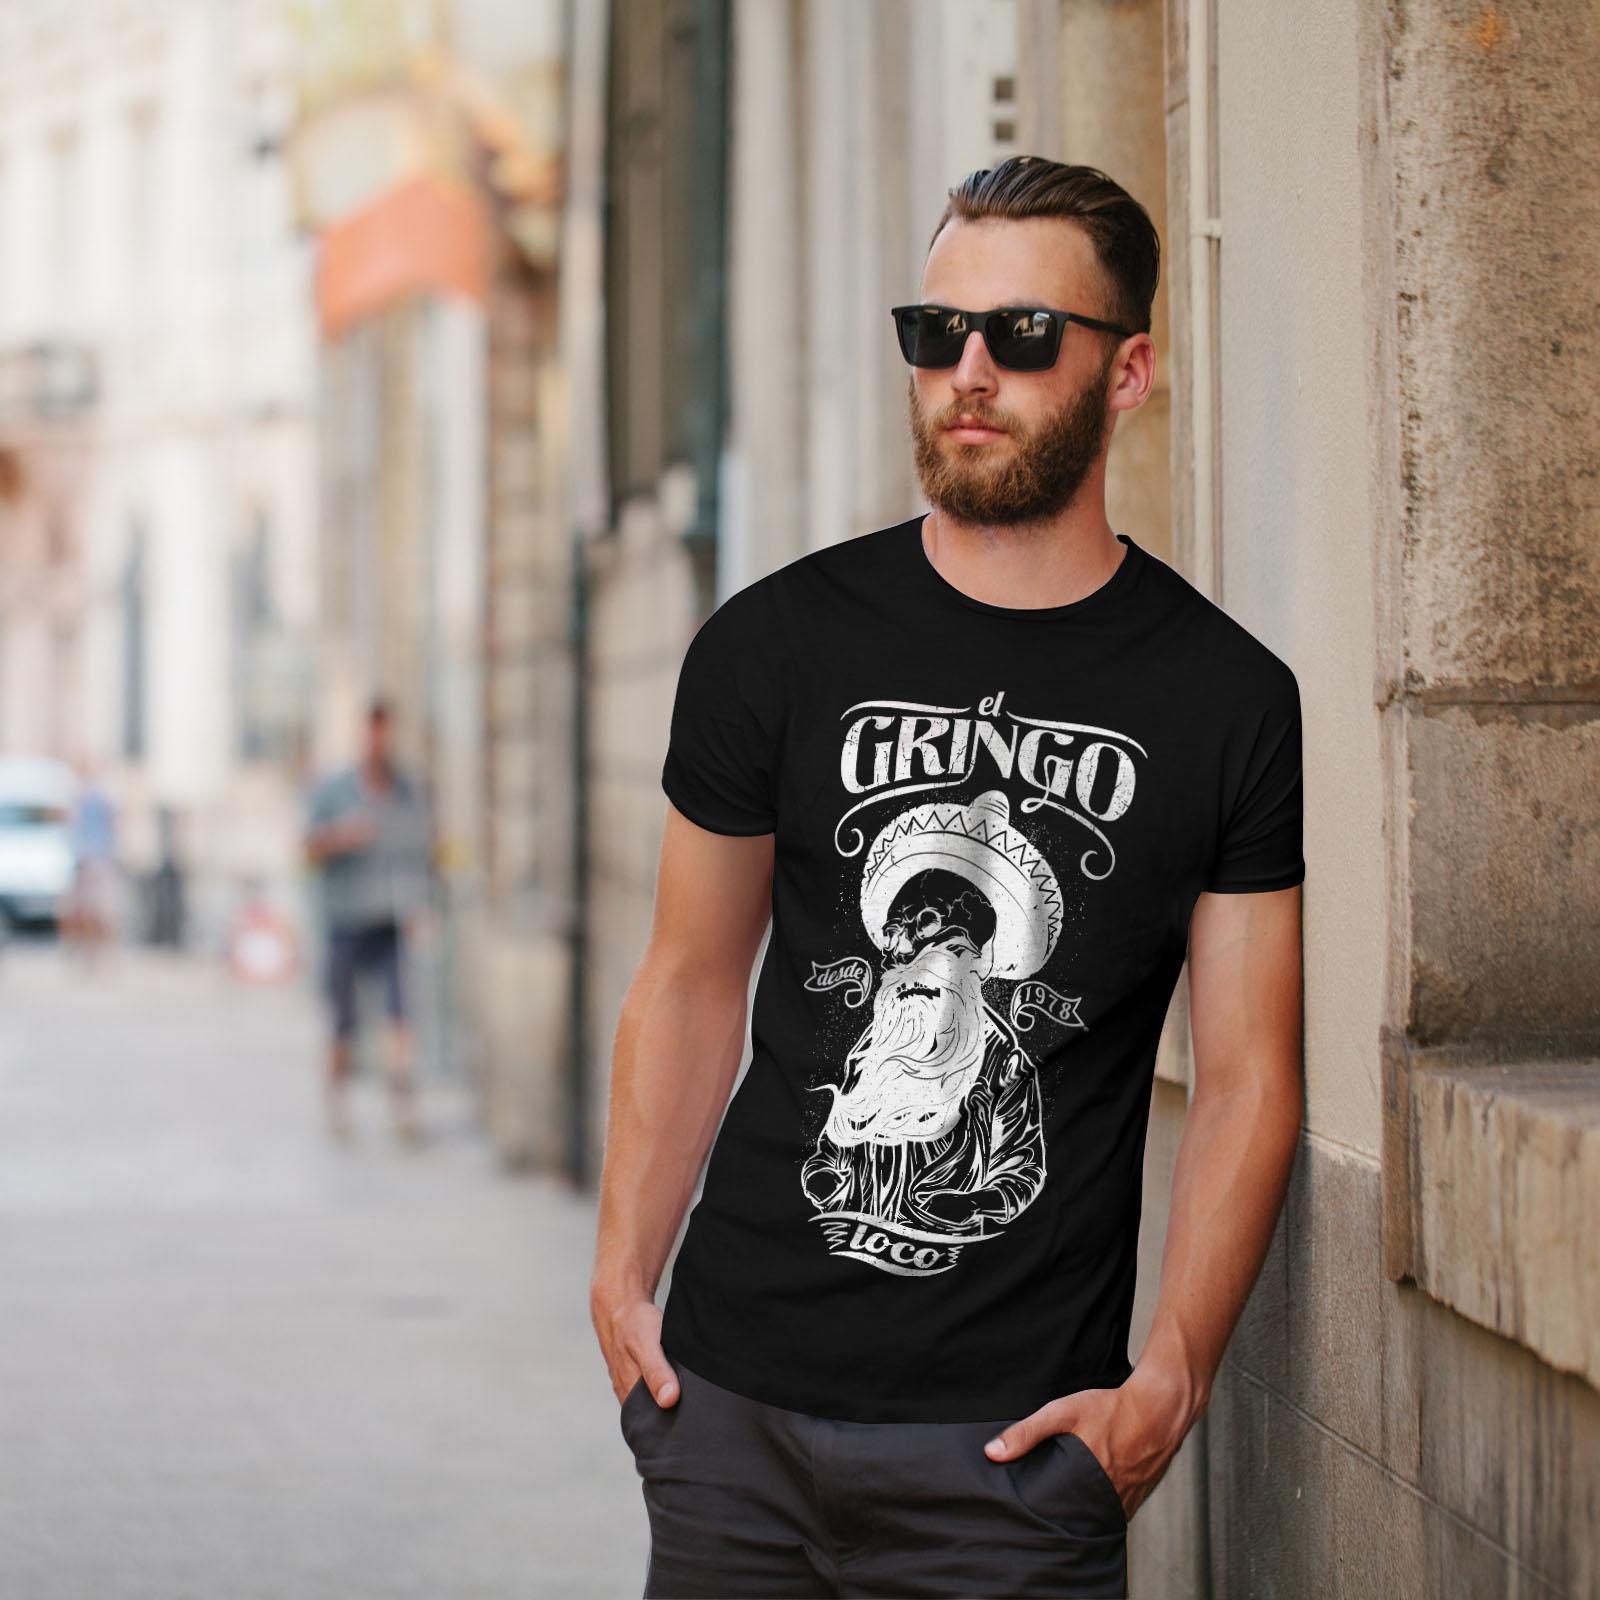 Wellcoda-Gringo-Beard-Skull-Mens-T-shirt-Mexico-Graphic-Design-Printed-Tee thumbnail 5